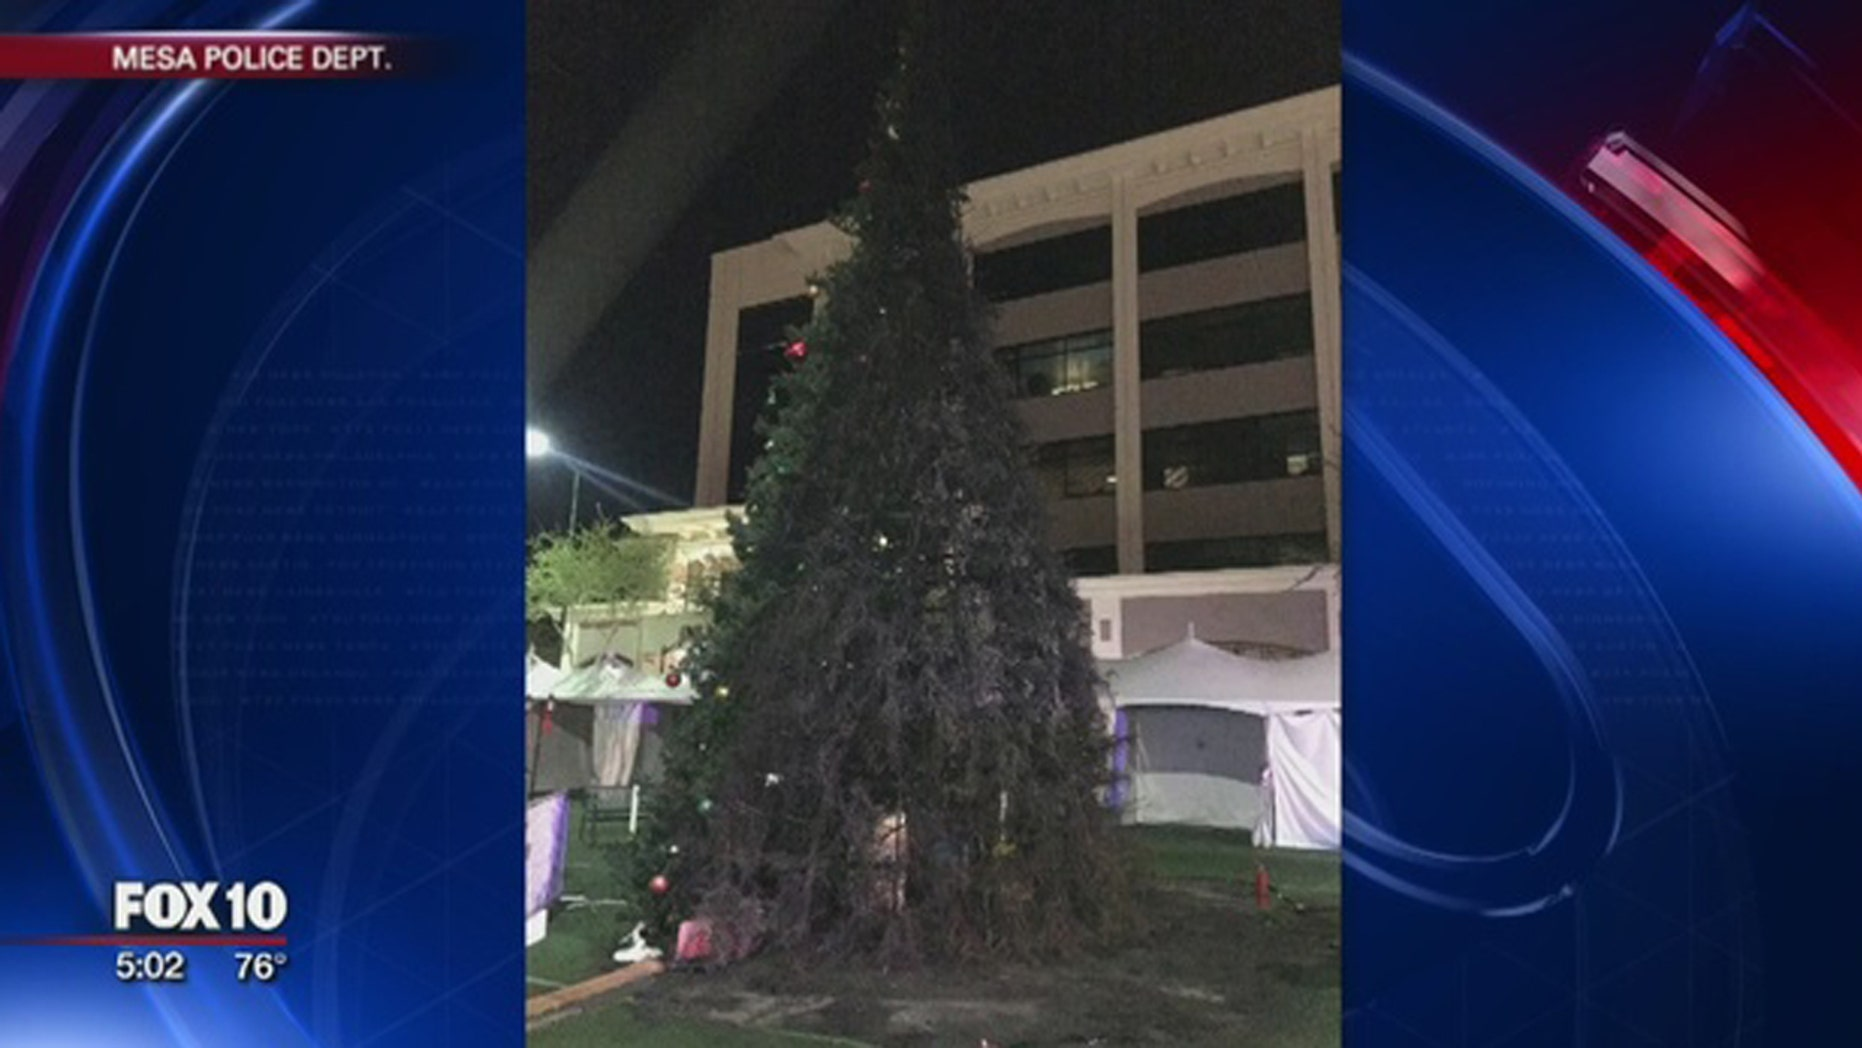 An Arizona man is accused of burning down Mesa's town Christmas tree.